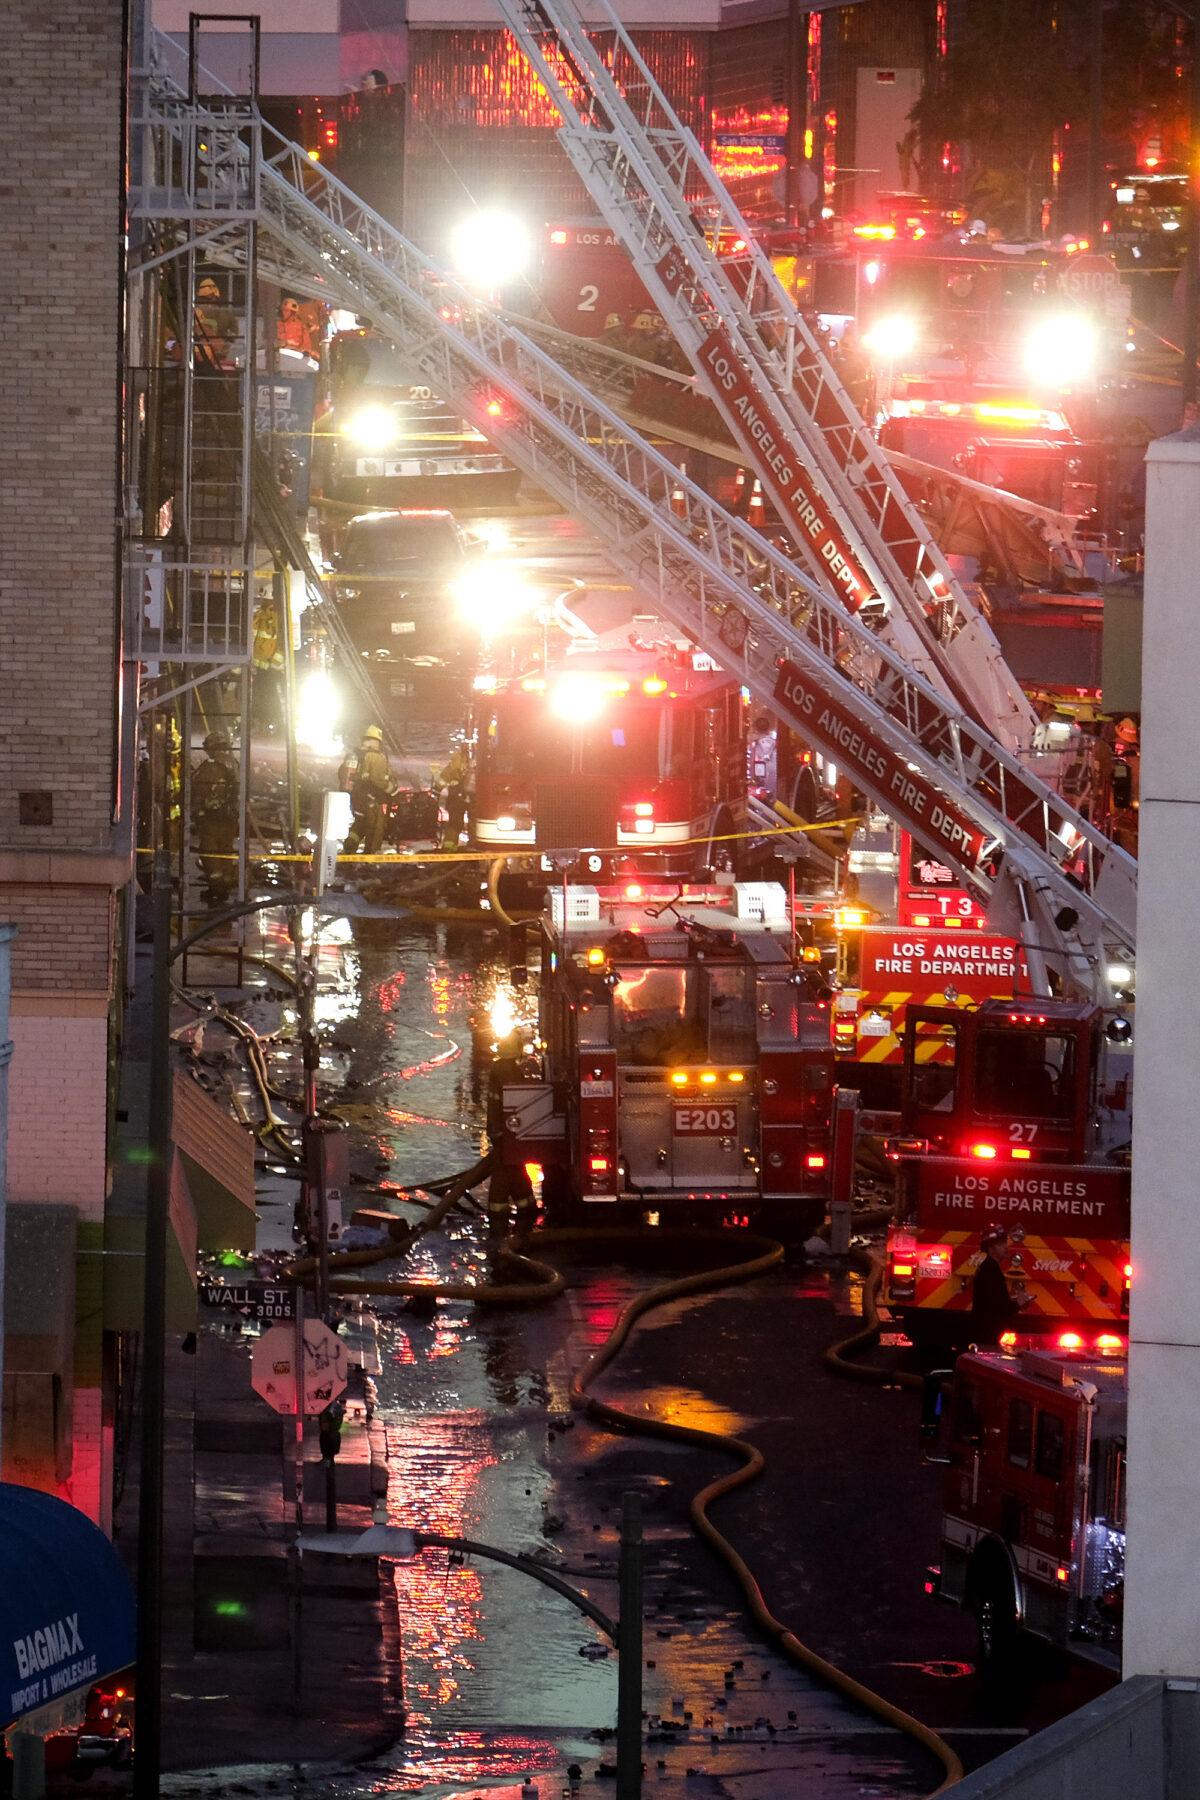 LA explosion firefights 3